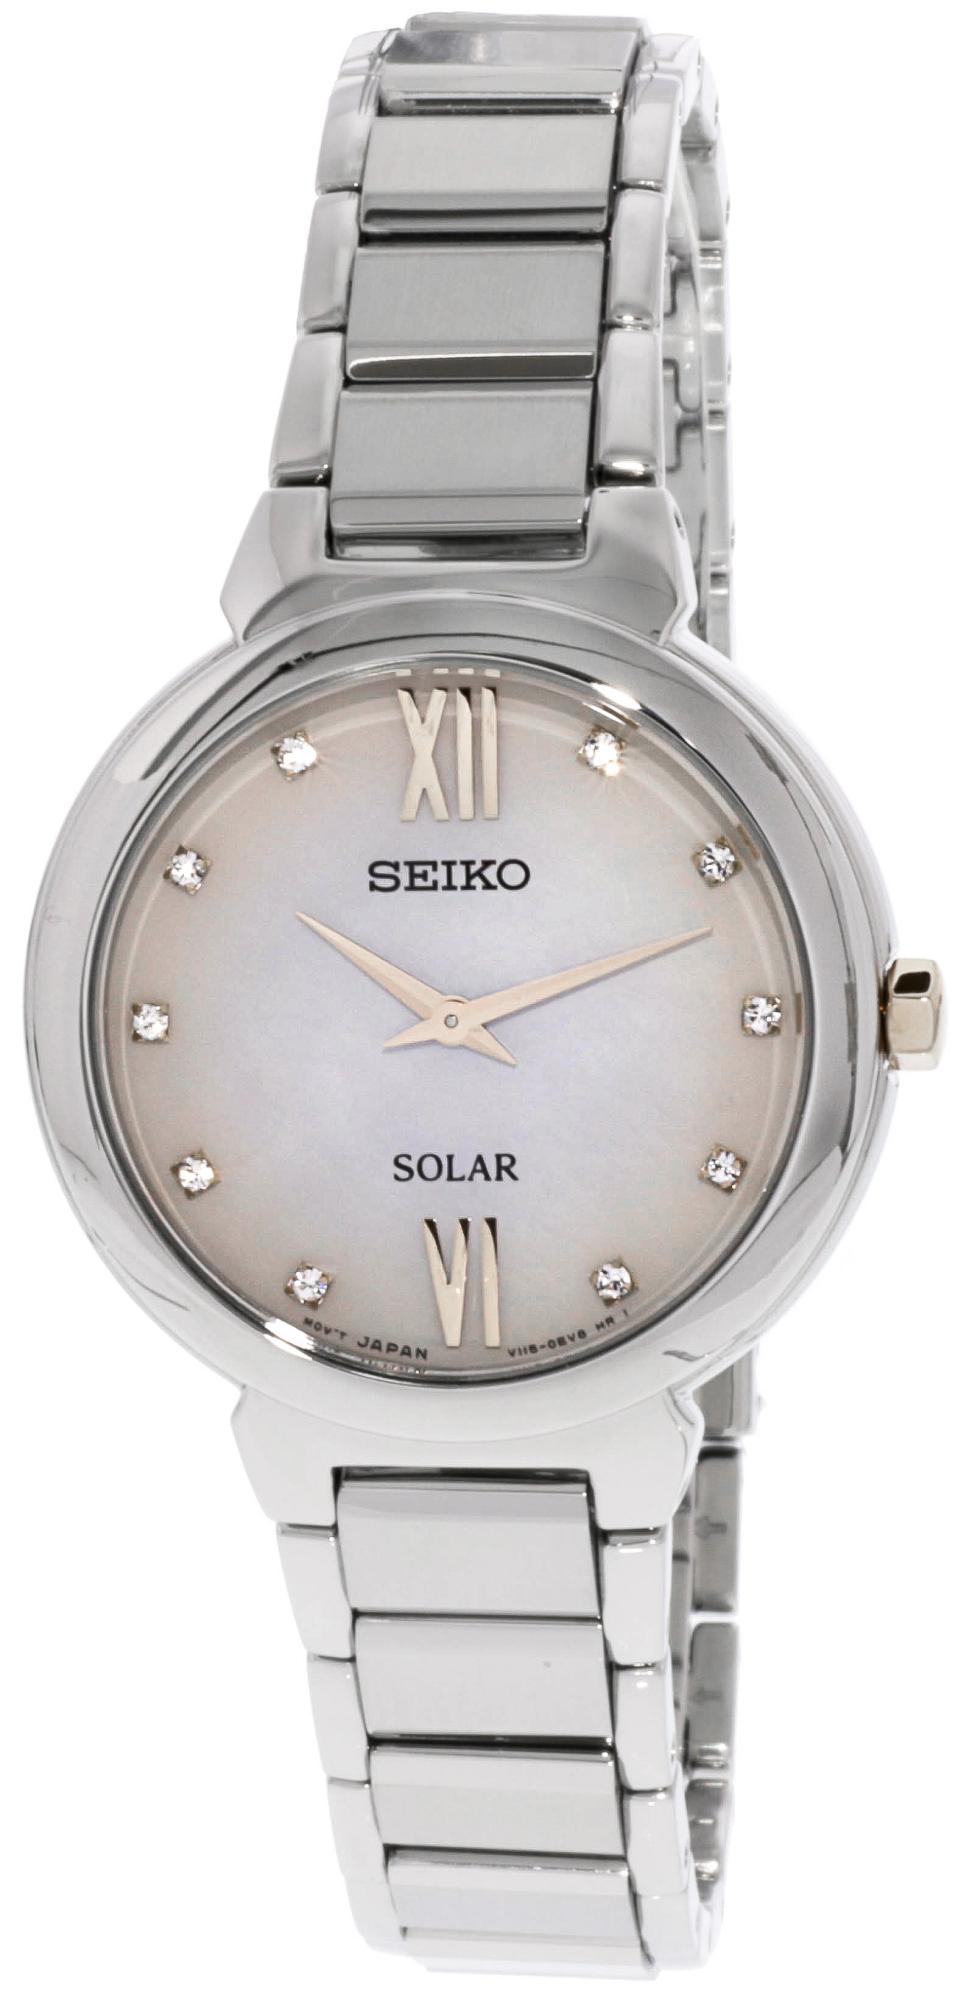 Seiko_Men's_SUP381_Silver_Stainless-Steel_Japanese_Quartz_Fashion_Watch